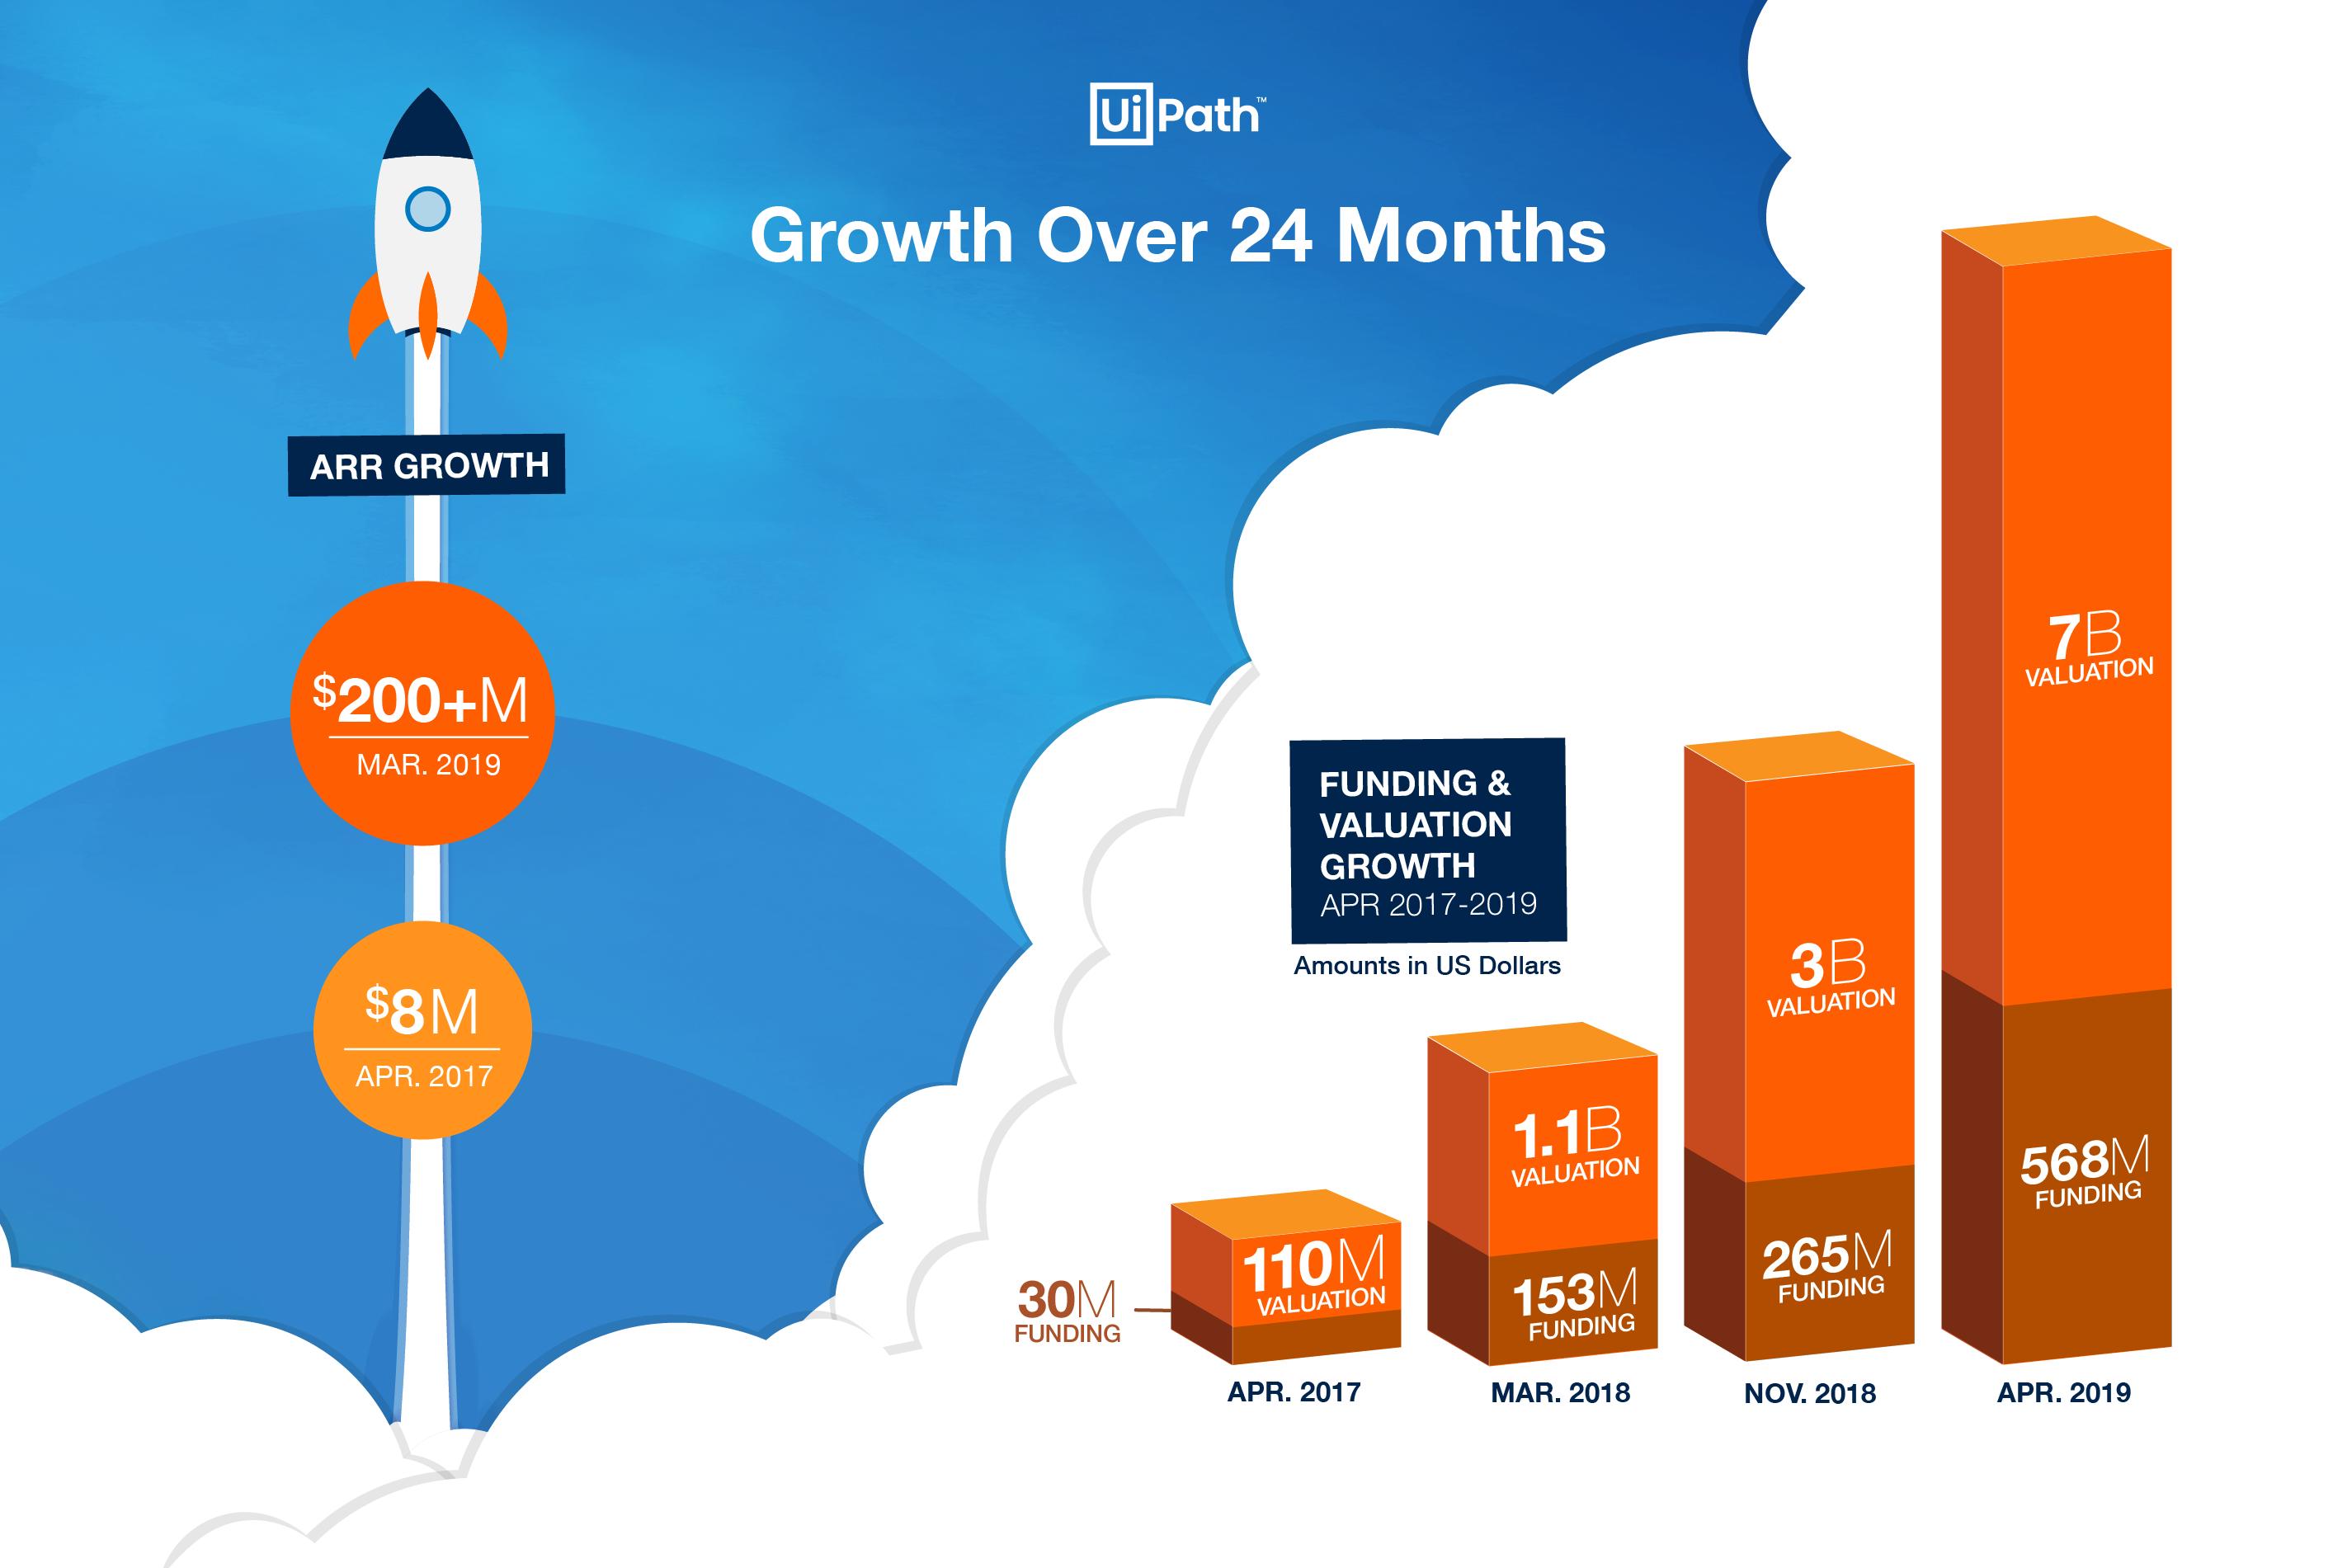 uipath-funding-infographic-english-01